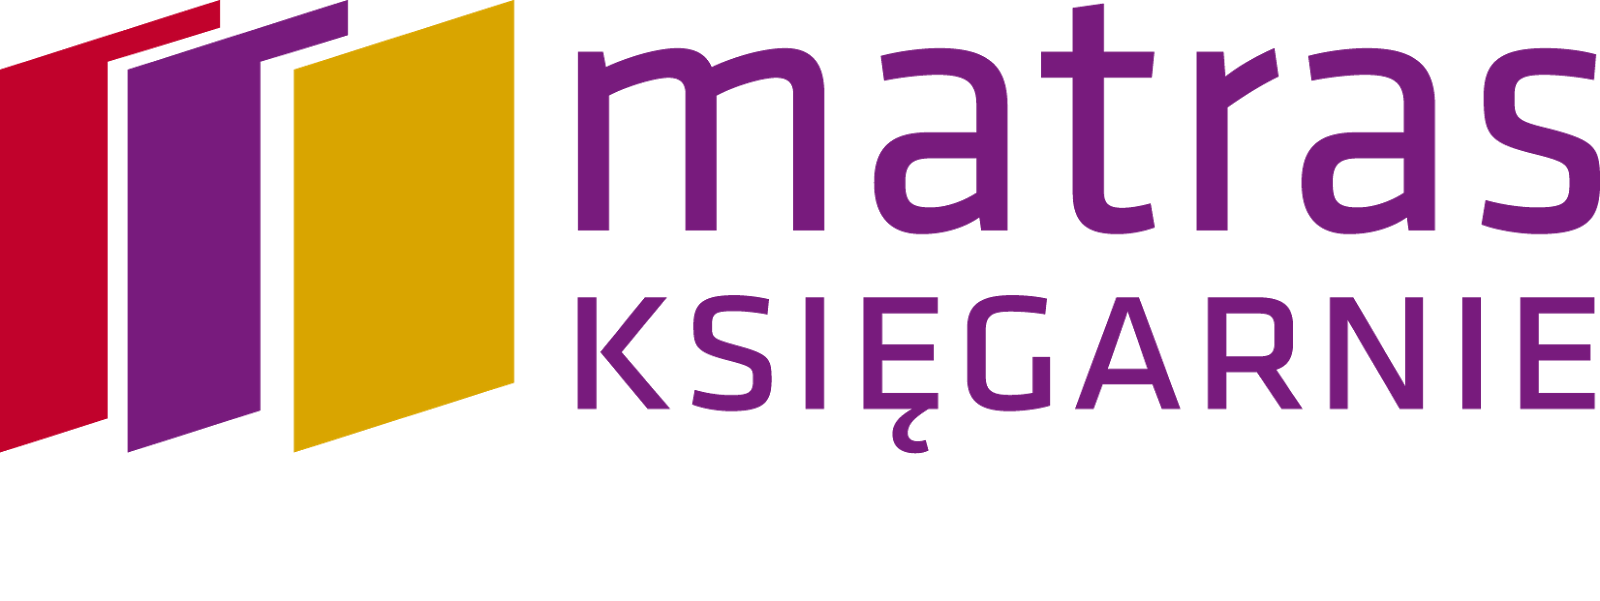 Księgarnie Matras